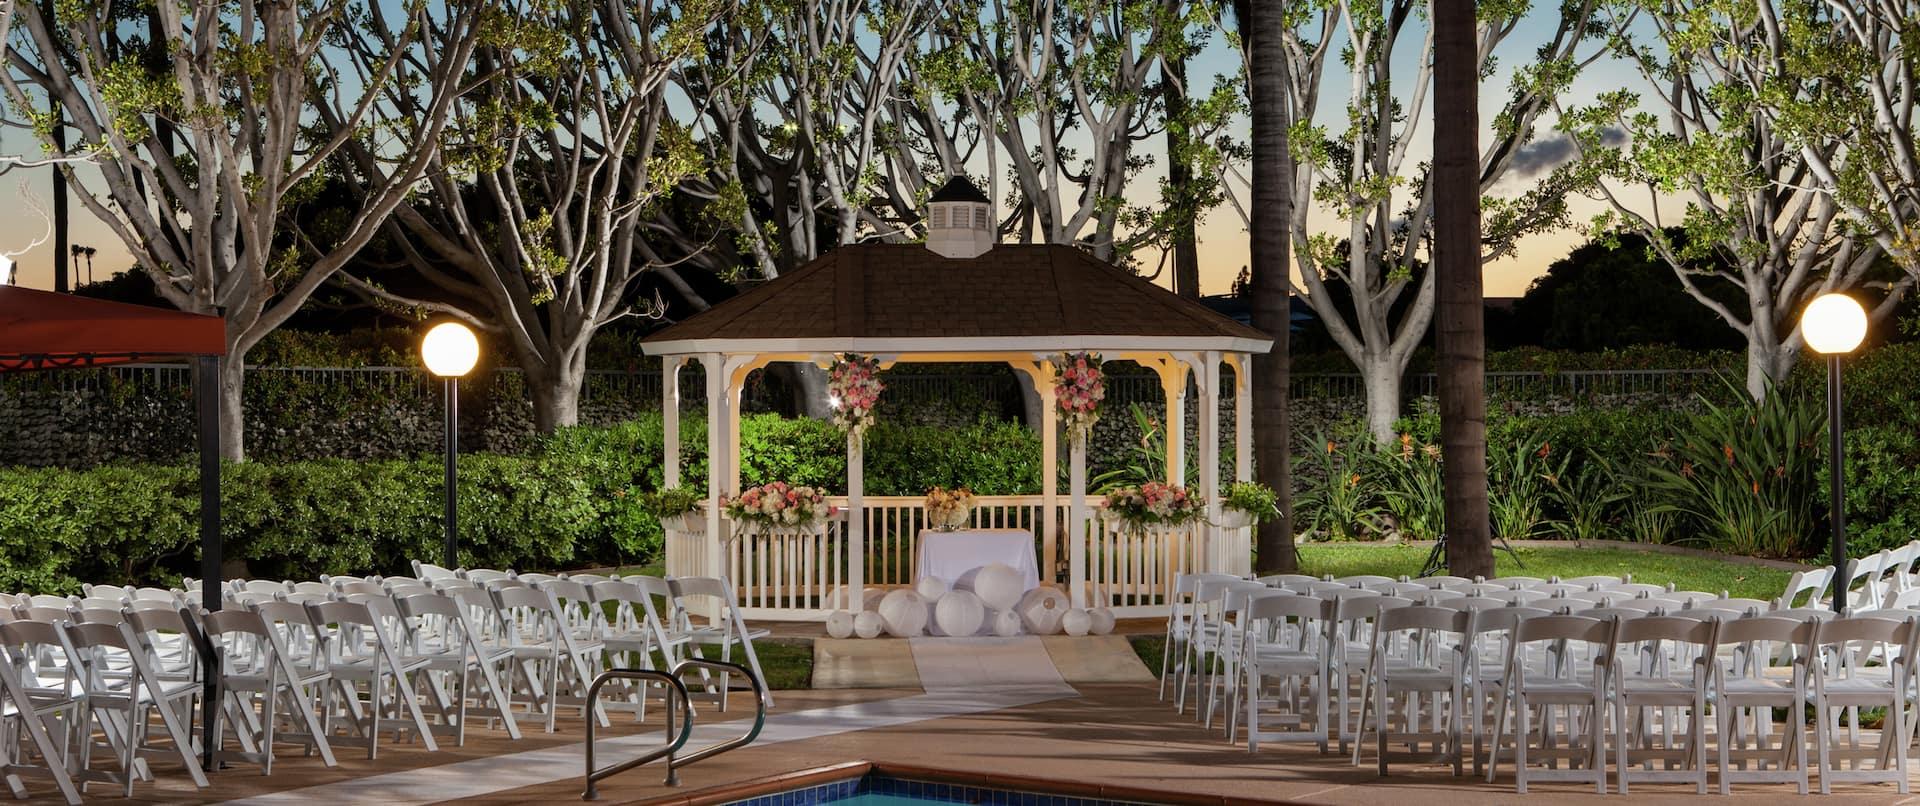 Pool Wedding Gazebo